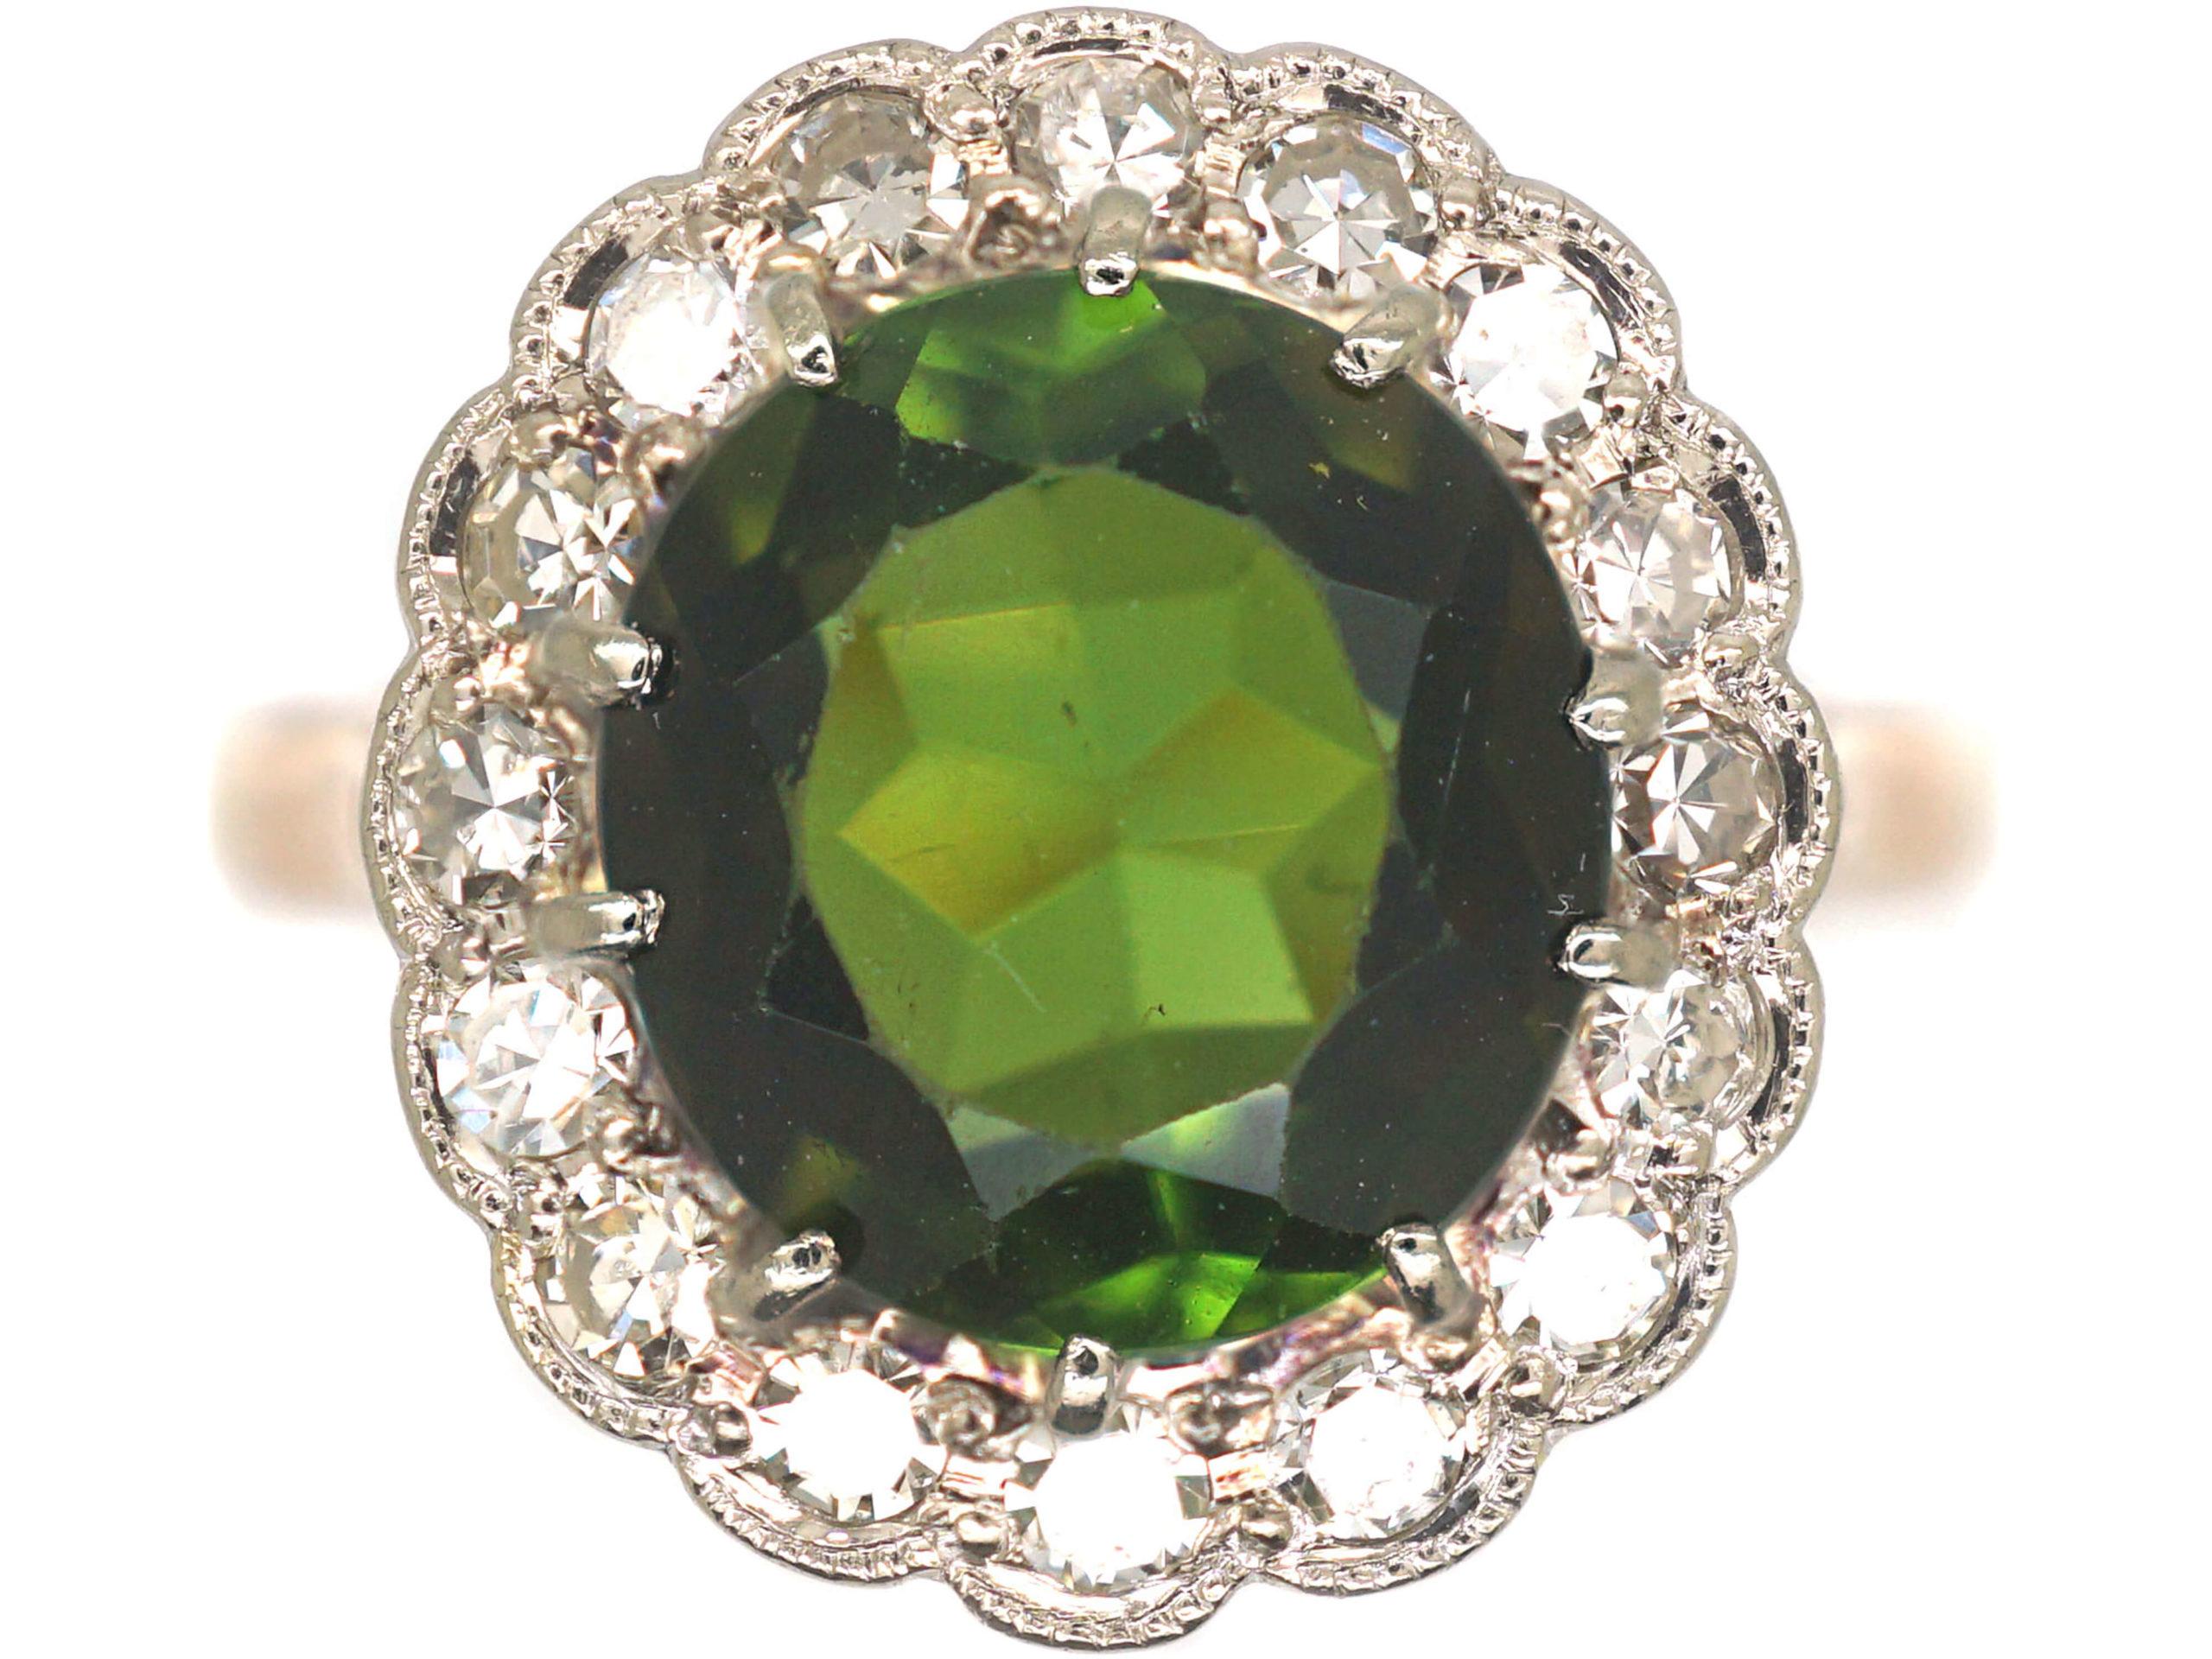 18ct Gold & Platinum, Green Tourmaline & Diamond Cluster Ring